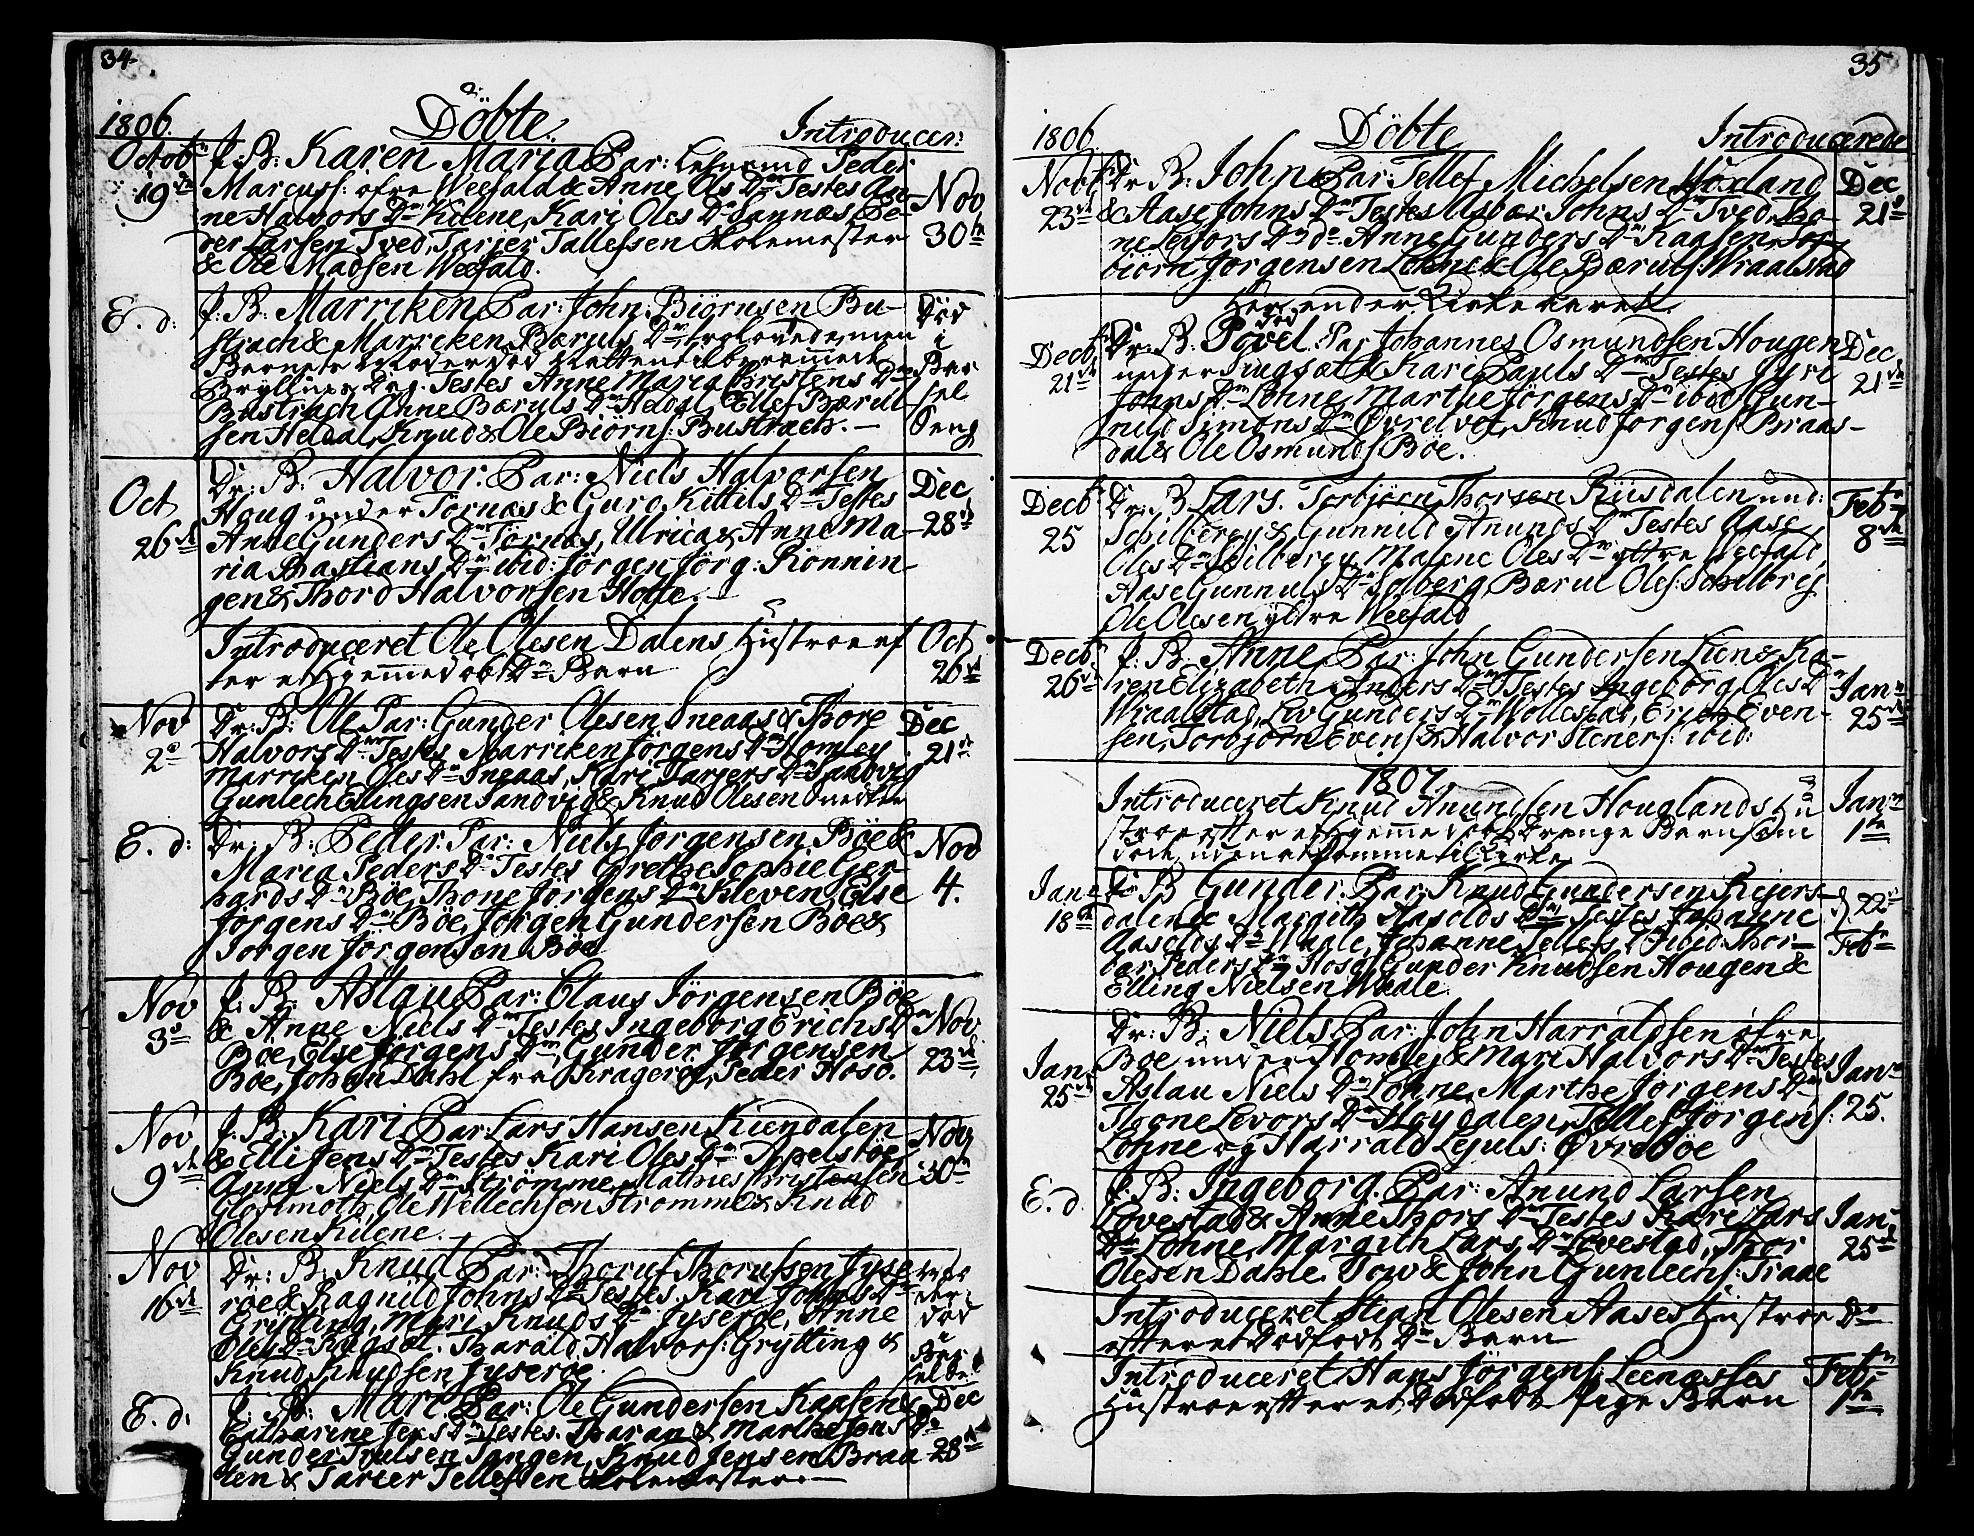 SAKO, Drangedal kirkebøker, F/Fa/L0004: Ministerialbok nr. 4, 1802-1814, s. 34-35